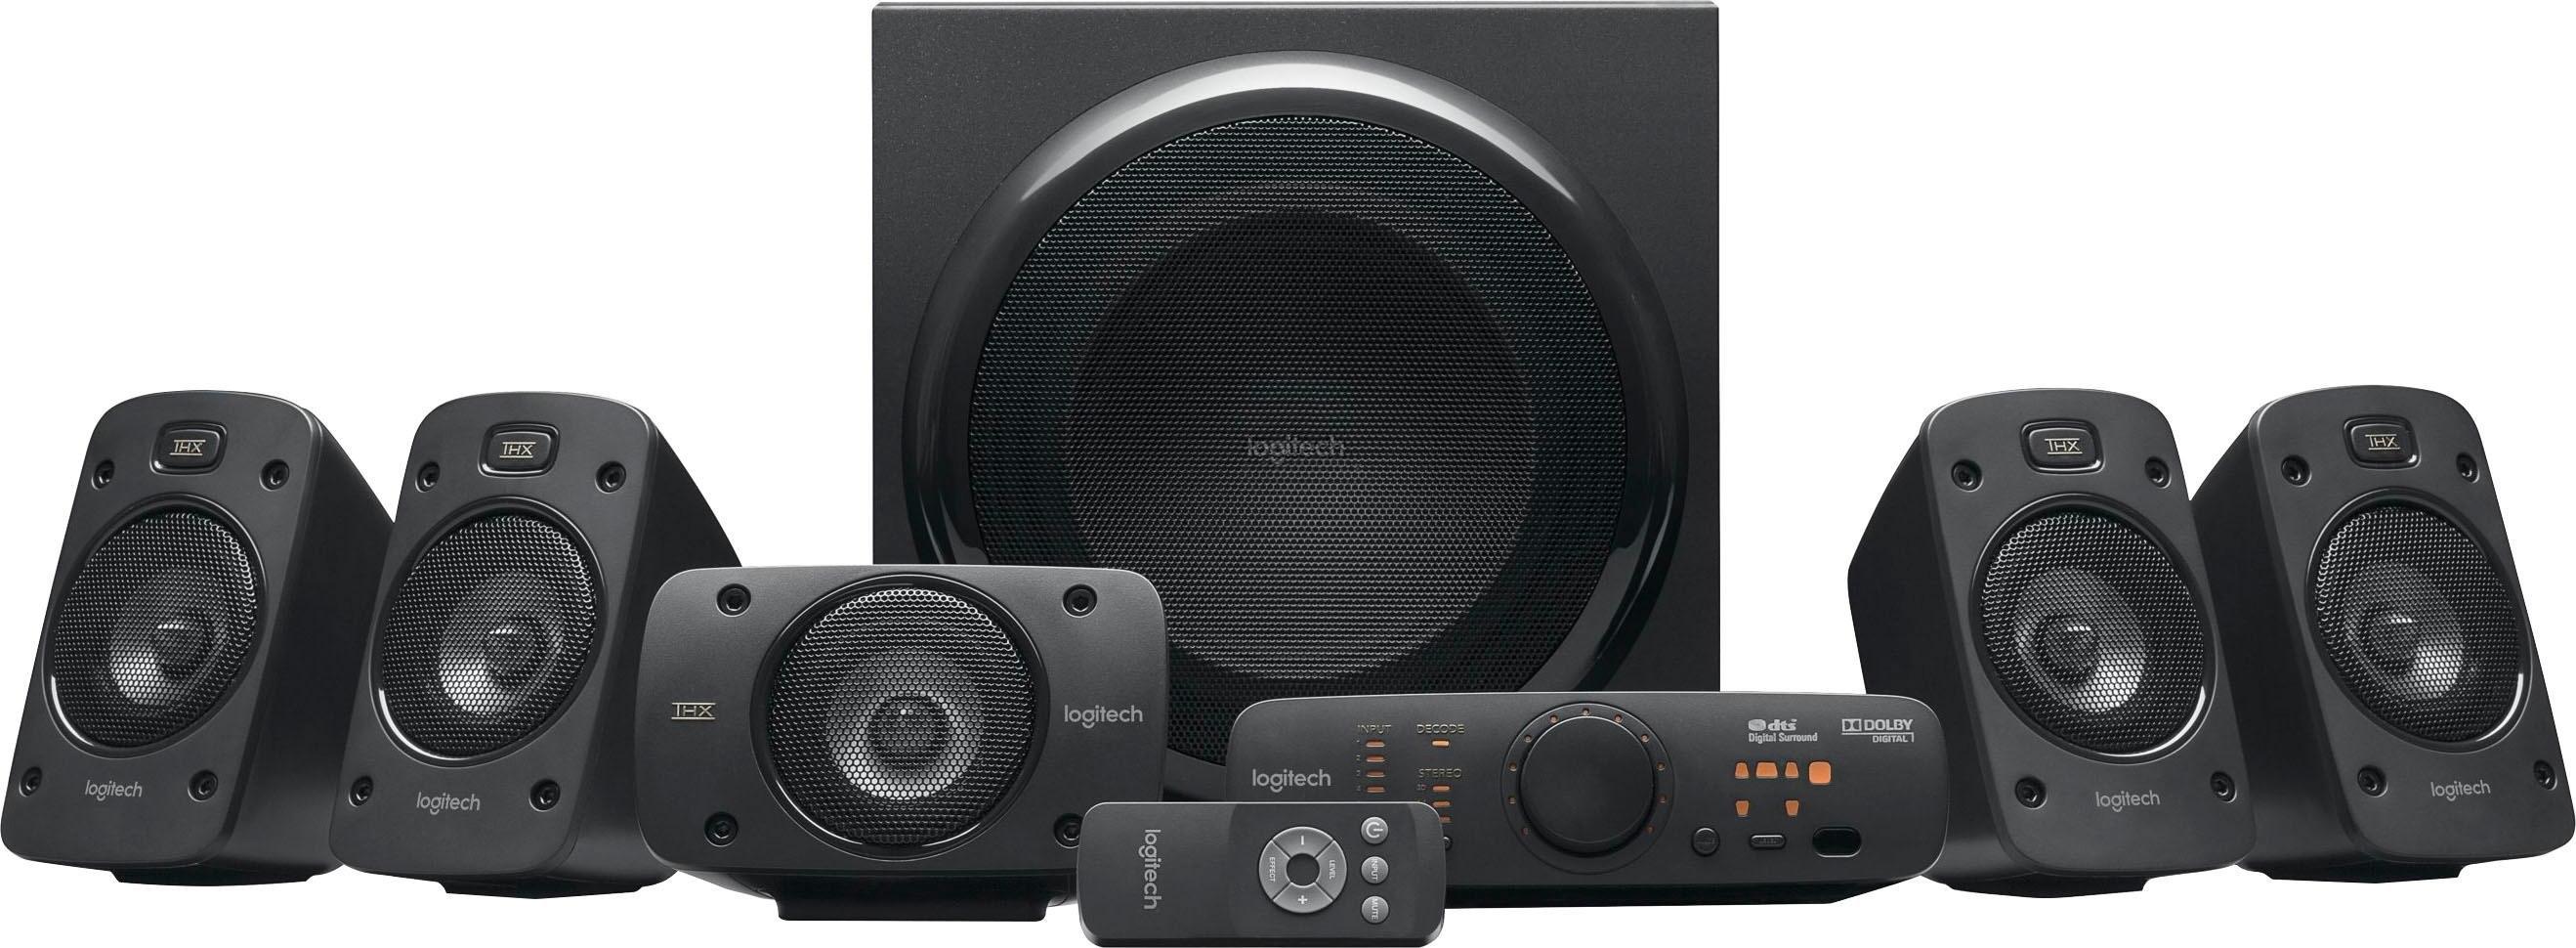 Logitech »Z906 Surround Sound« 5.1-luidsprekersysteem (500 watt) in de webshop van OTTO kopen